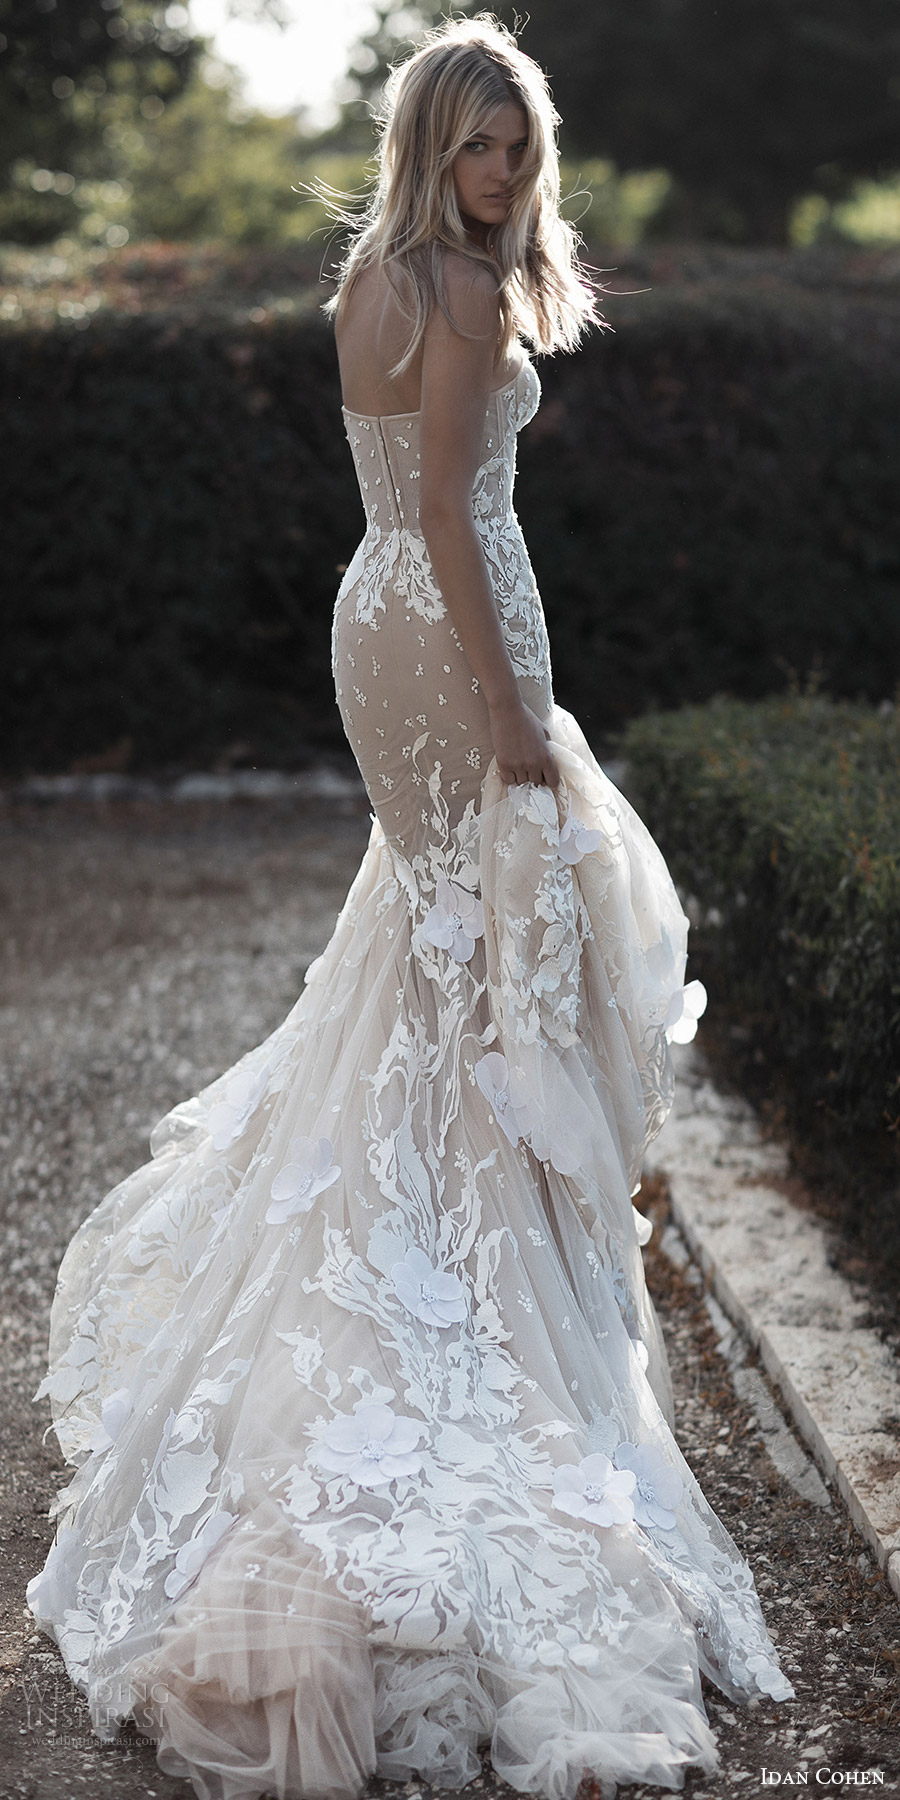 vestido de novia Idan Cohen 2017 sin tirantes de boda del amor de la sirena (Emily Mercedes) bv larga cola